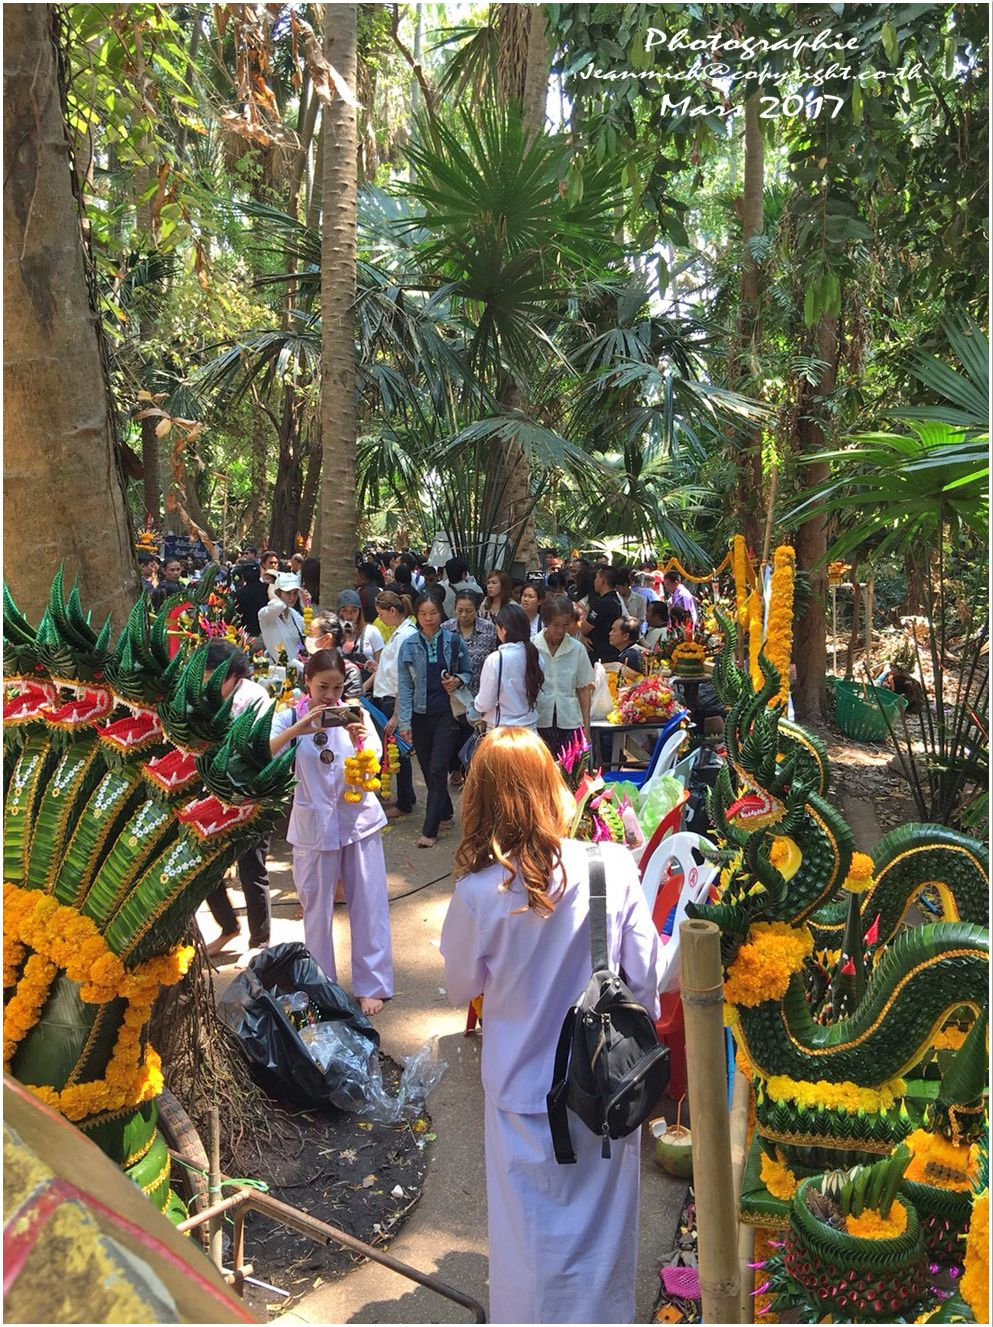 1ère étape, un temple Wat Kham Chanot วัด คำ ชะ โน ด (province d'Udon Thani)